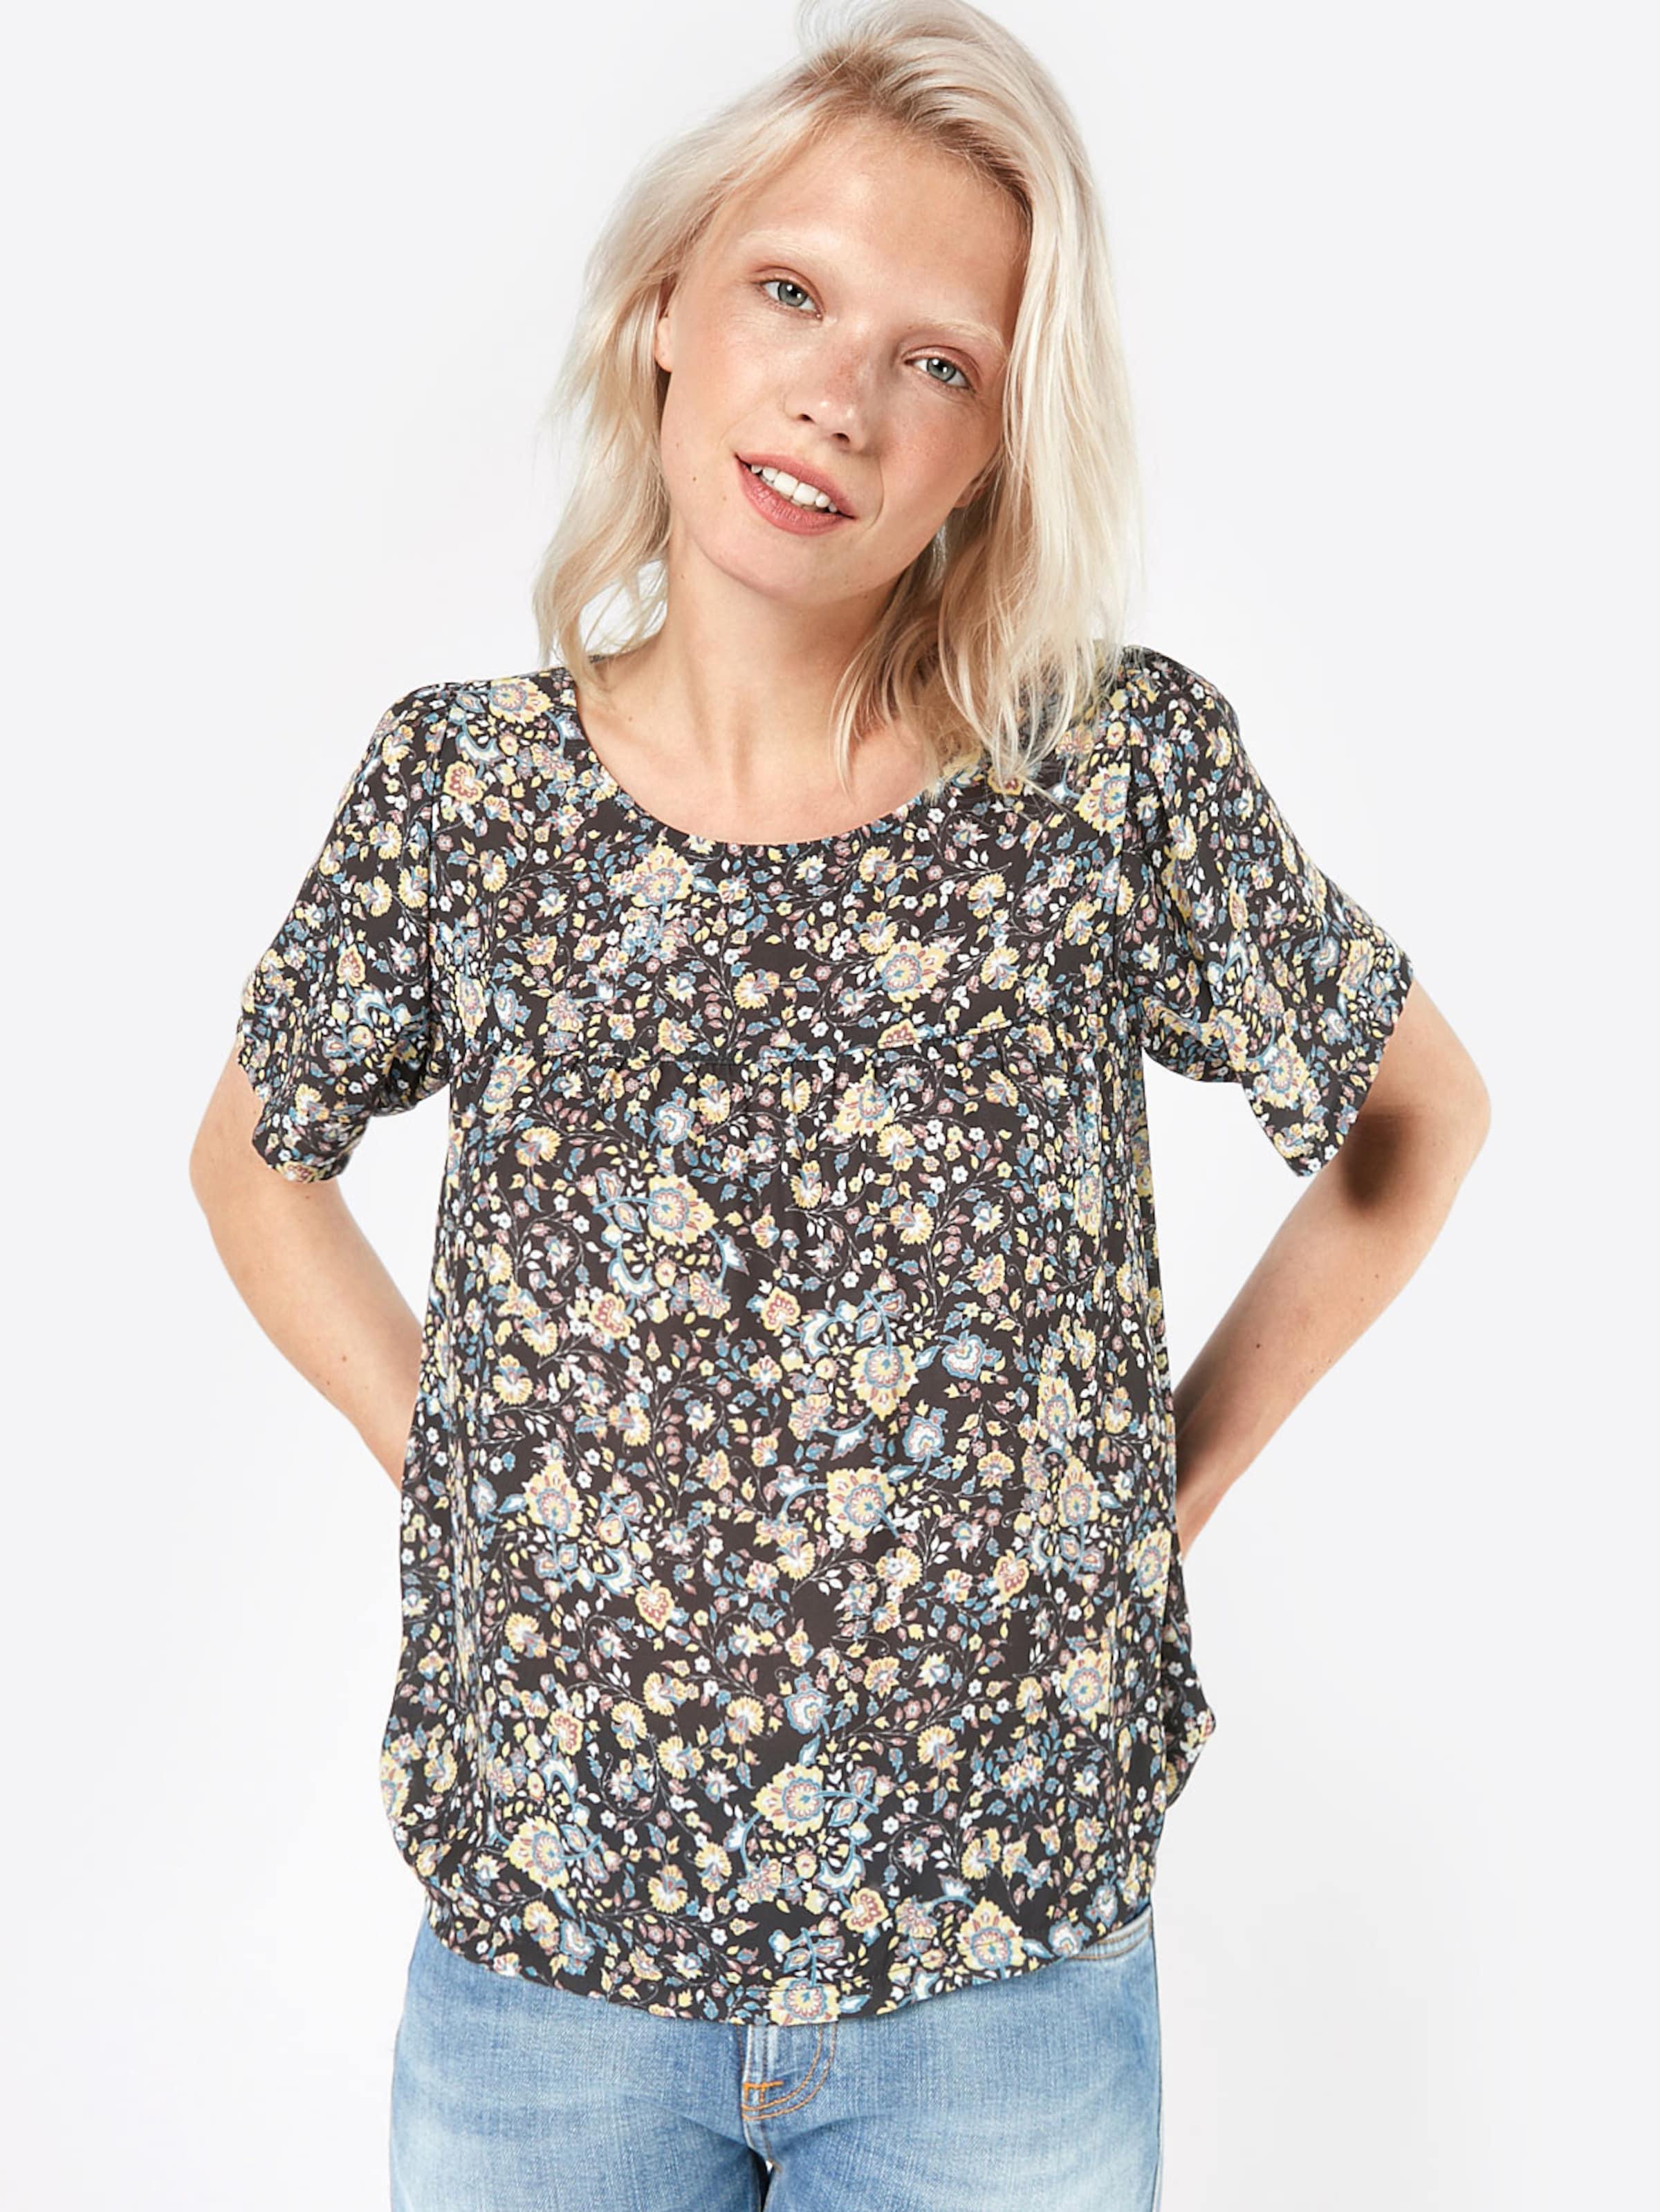 anna & ella Shirt 'Fabienne' Footlocker Bilder Auslass Beste Ort Auslass 2018 Unisex 100% Authentisch Größte Anbieter Günstiger Preis GDSyu9hH